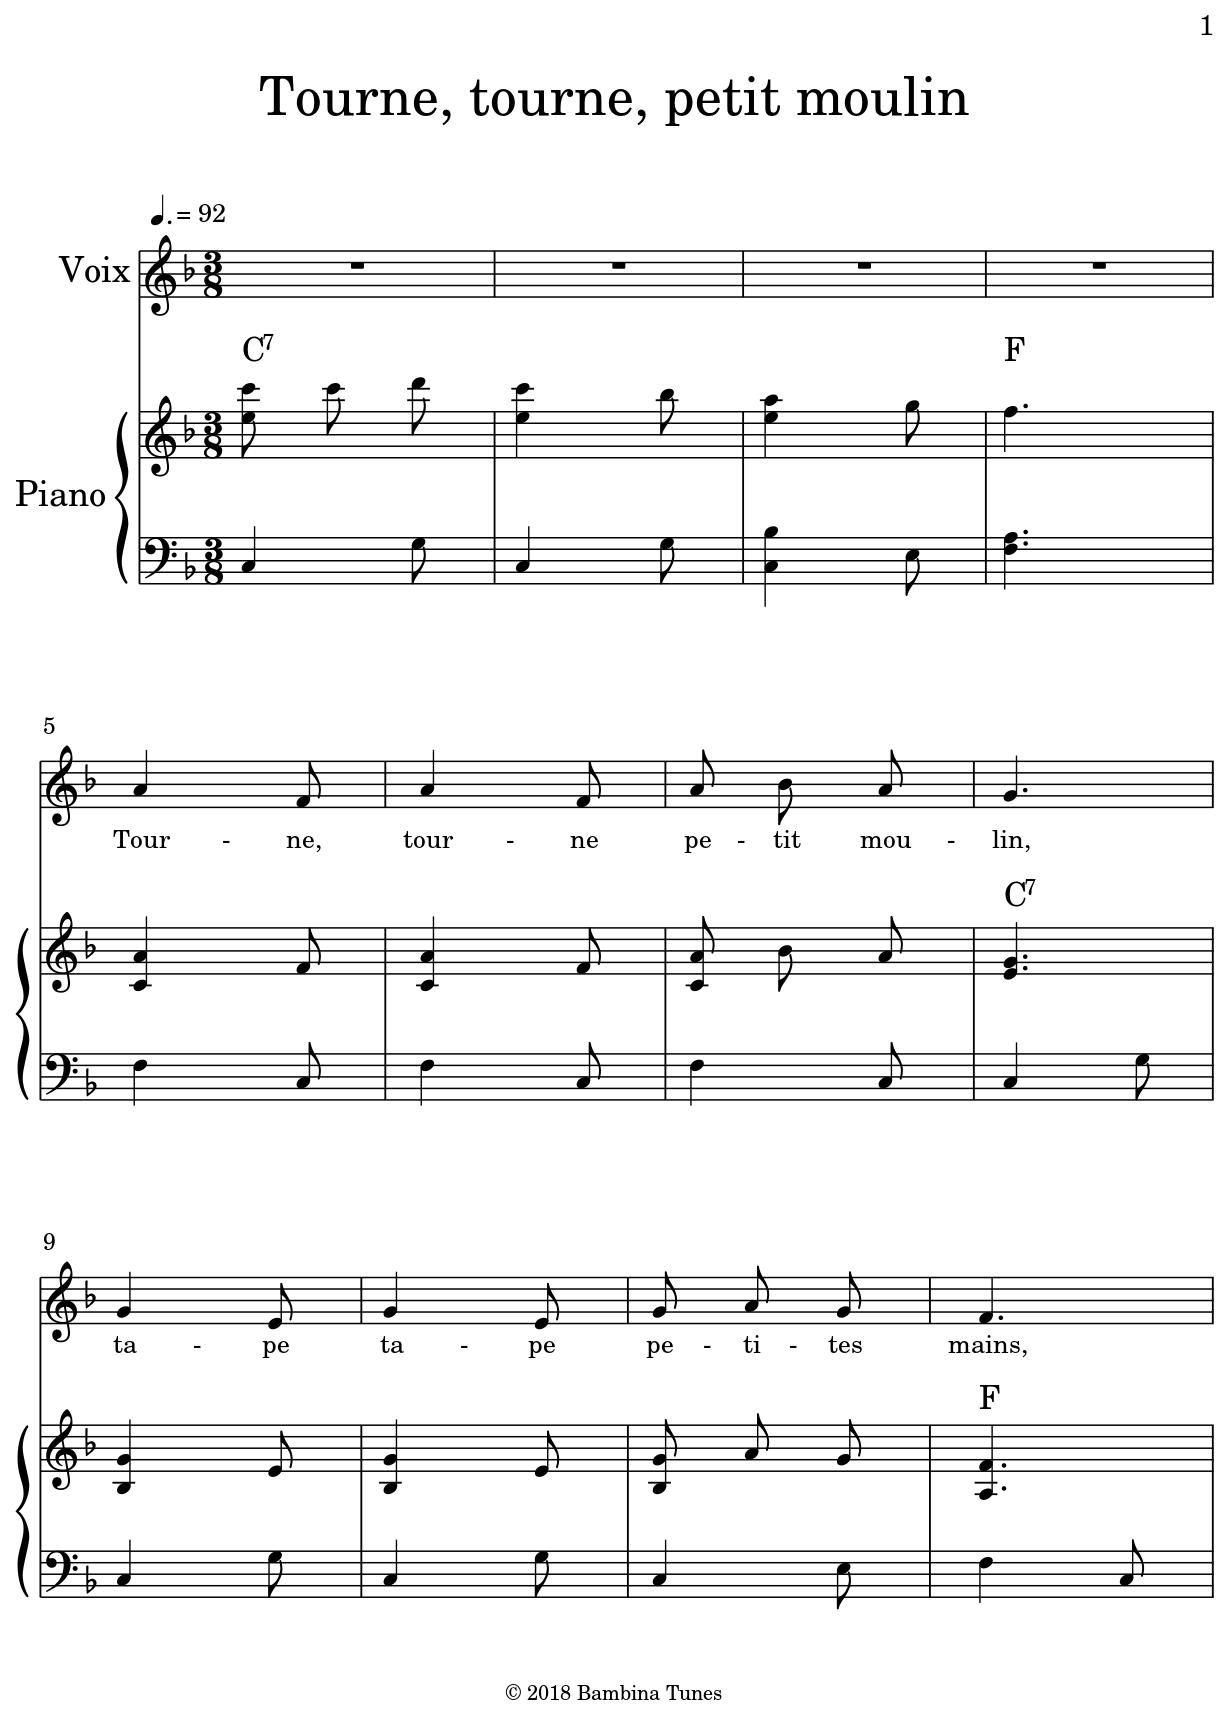 Tourne, Tourne, Petit Moulin : tourne,, petit, moulin, Tourne,, Petit, Moulin